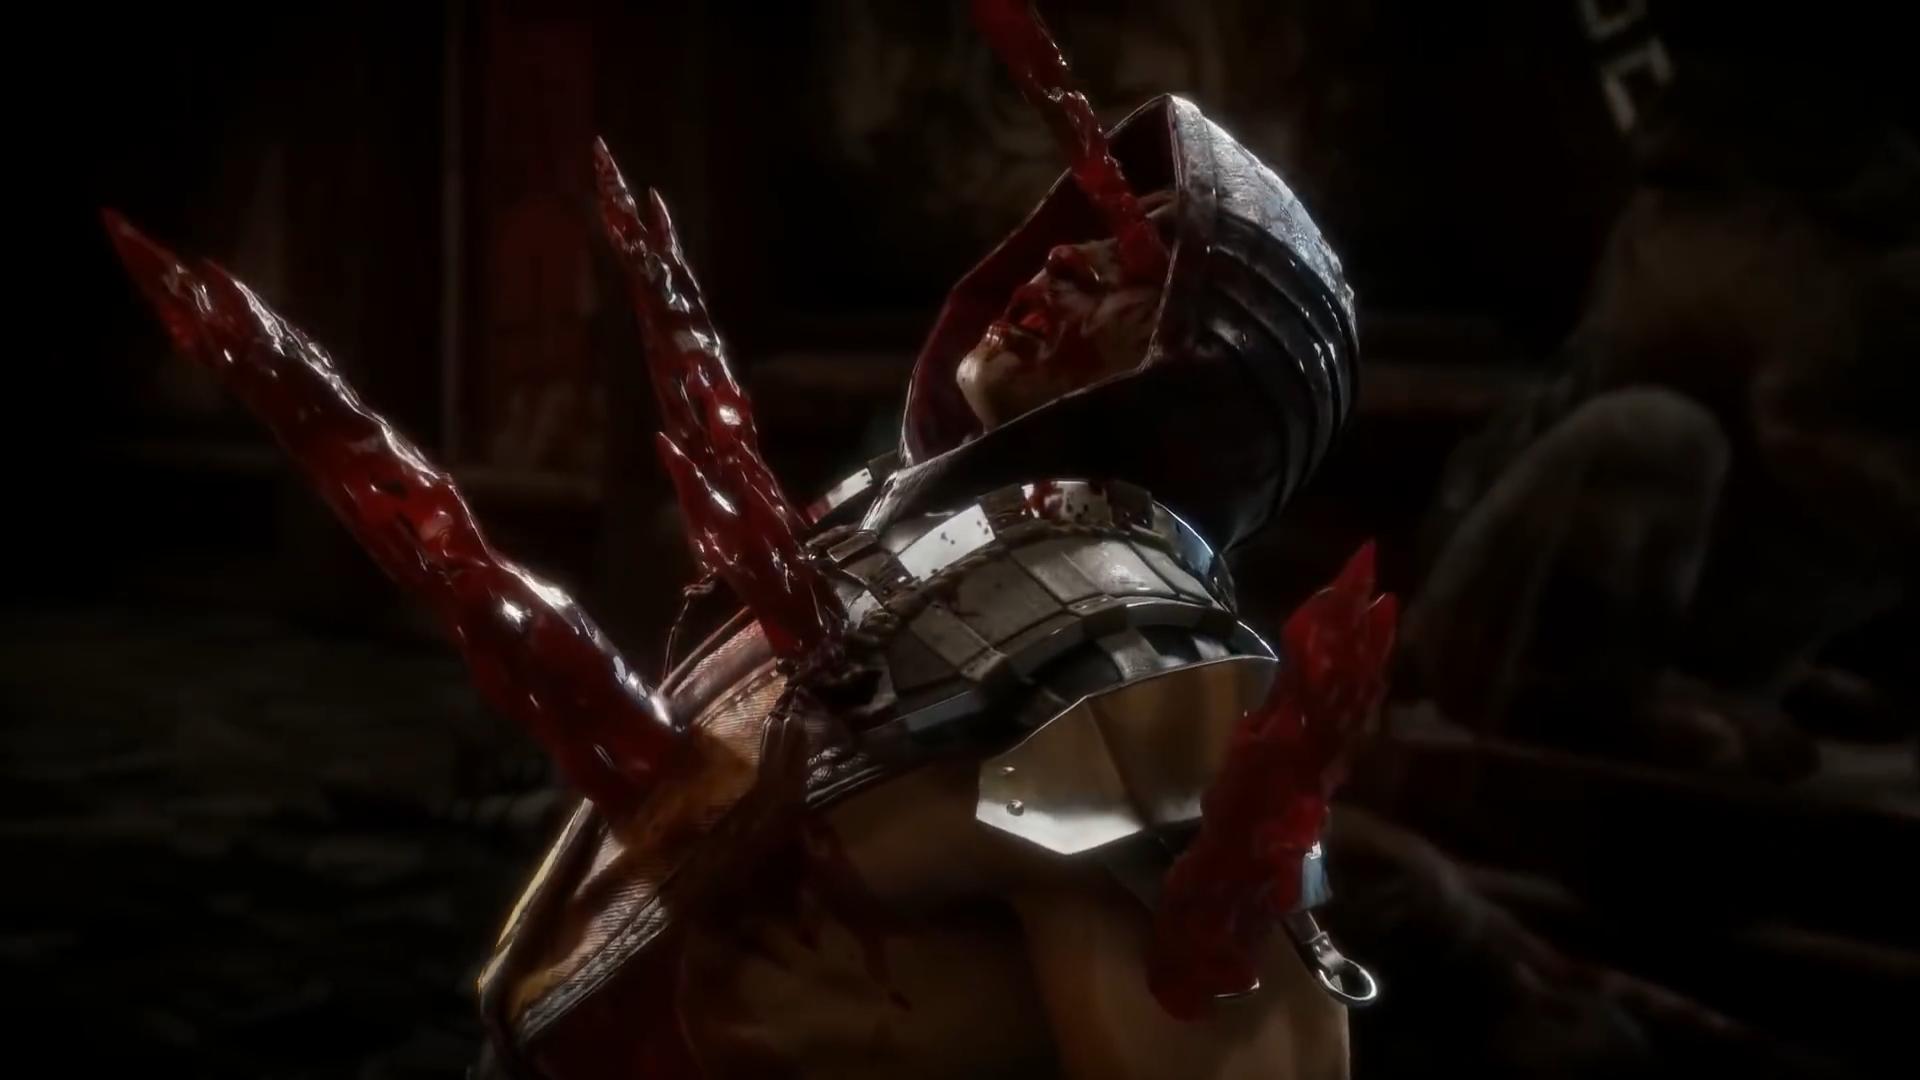 IMG_20190121_193704.972.jpg - Mortal Kombat 11